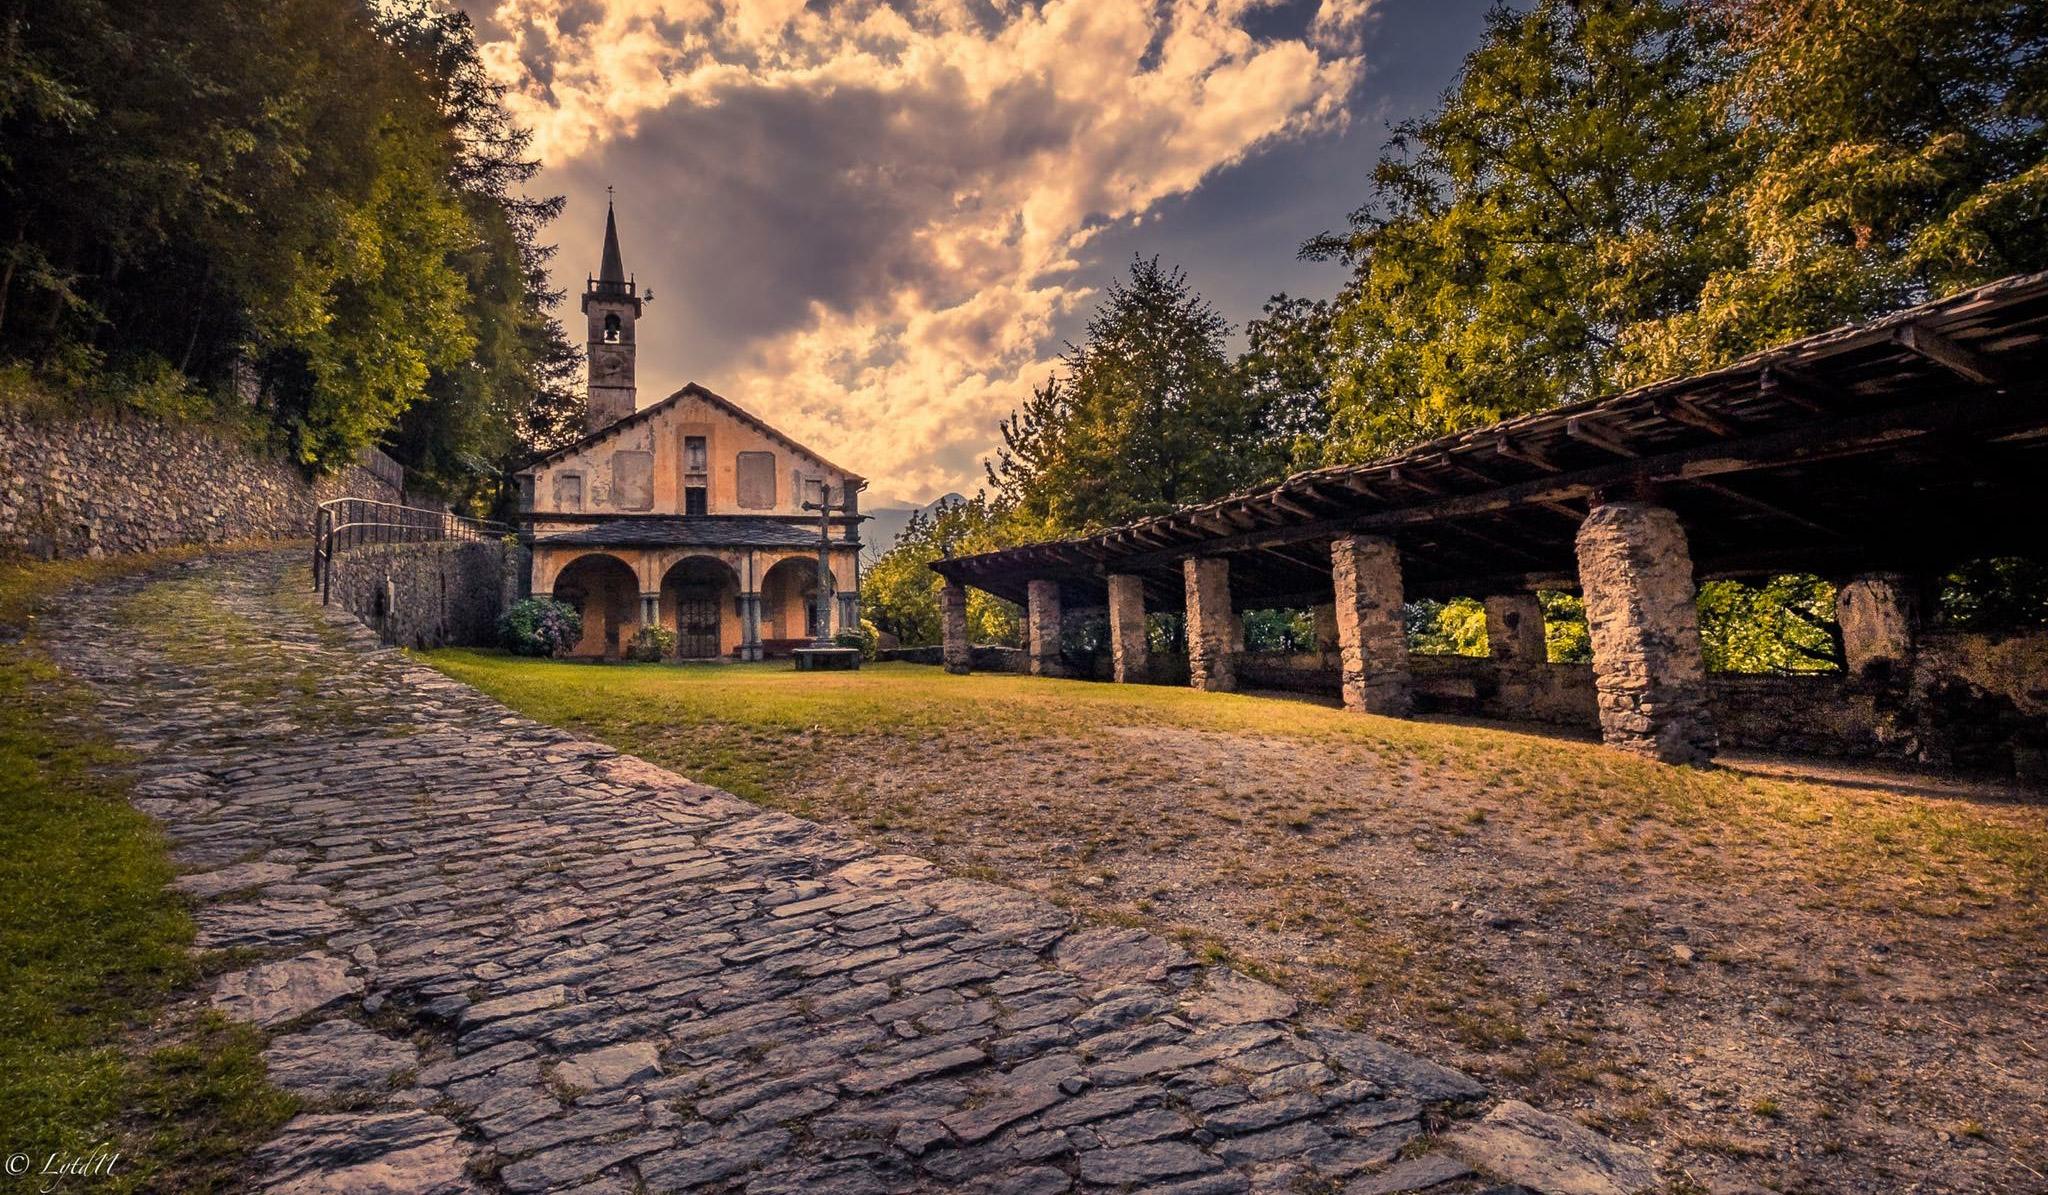 visite chiese e santuari in Valle d'Aosta